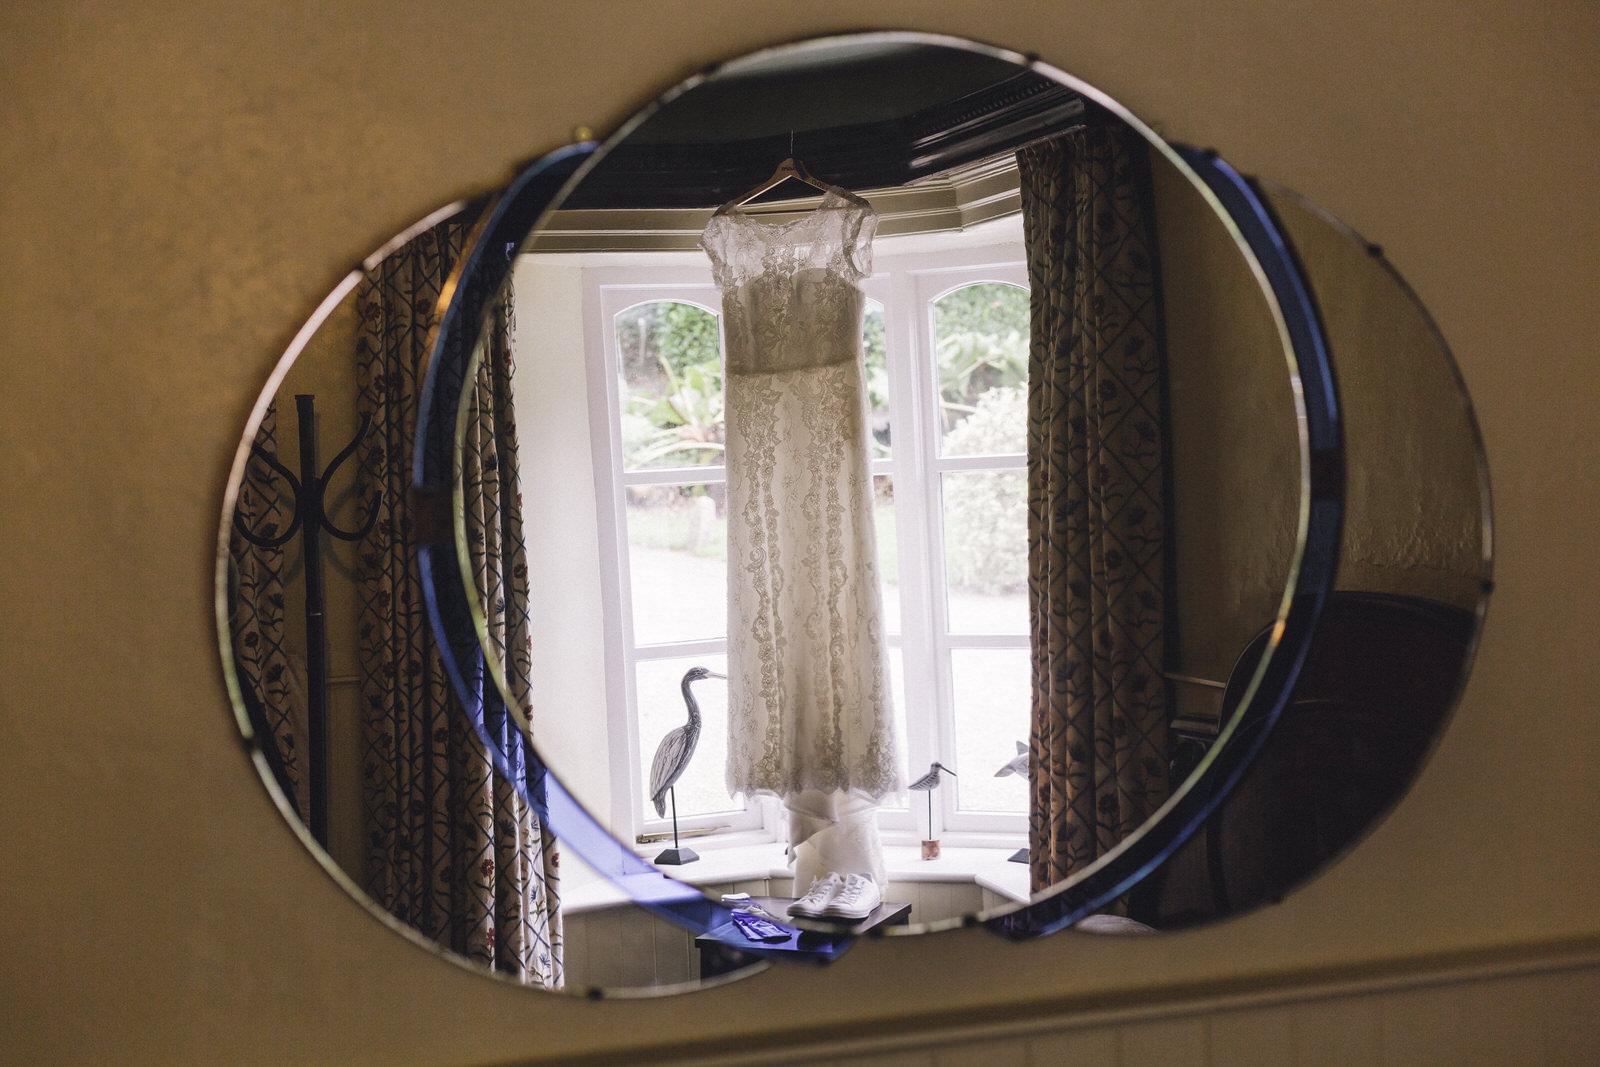 Balybeg-house-ireland-wicklow-wedding-photographer-roger-kenny_greystones004.jpg